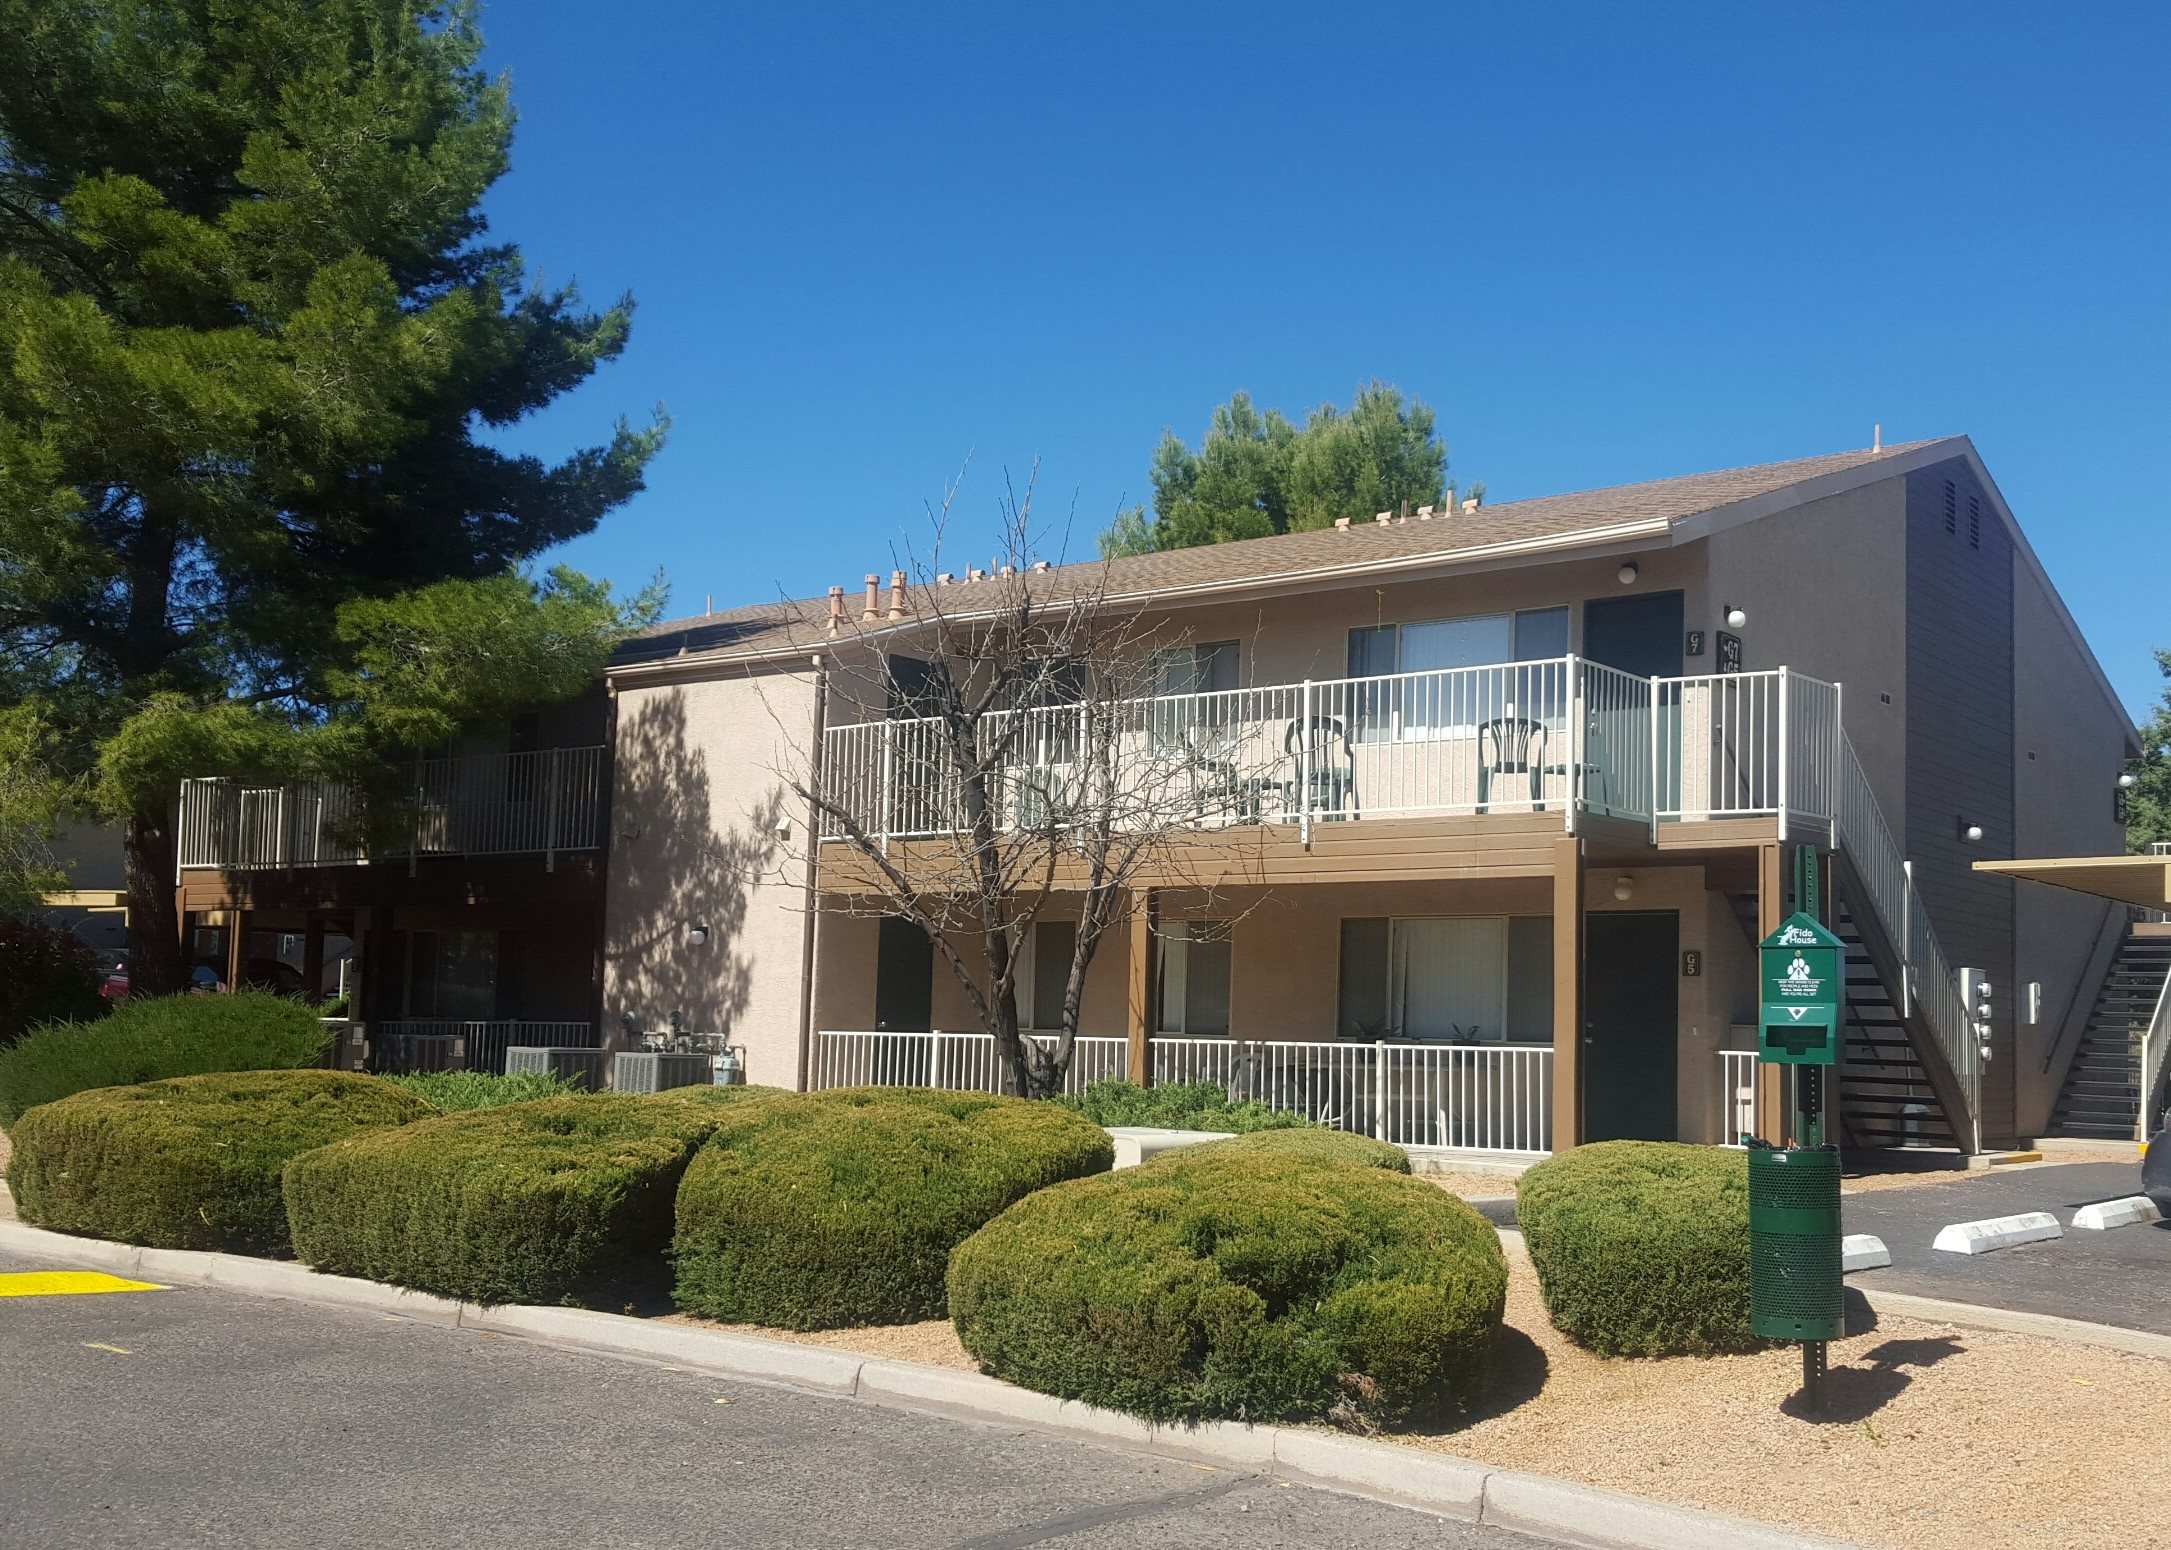 Rio verde apartments in cottonwood az 86326 for Cottonwood house